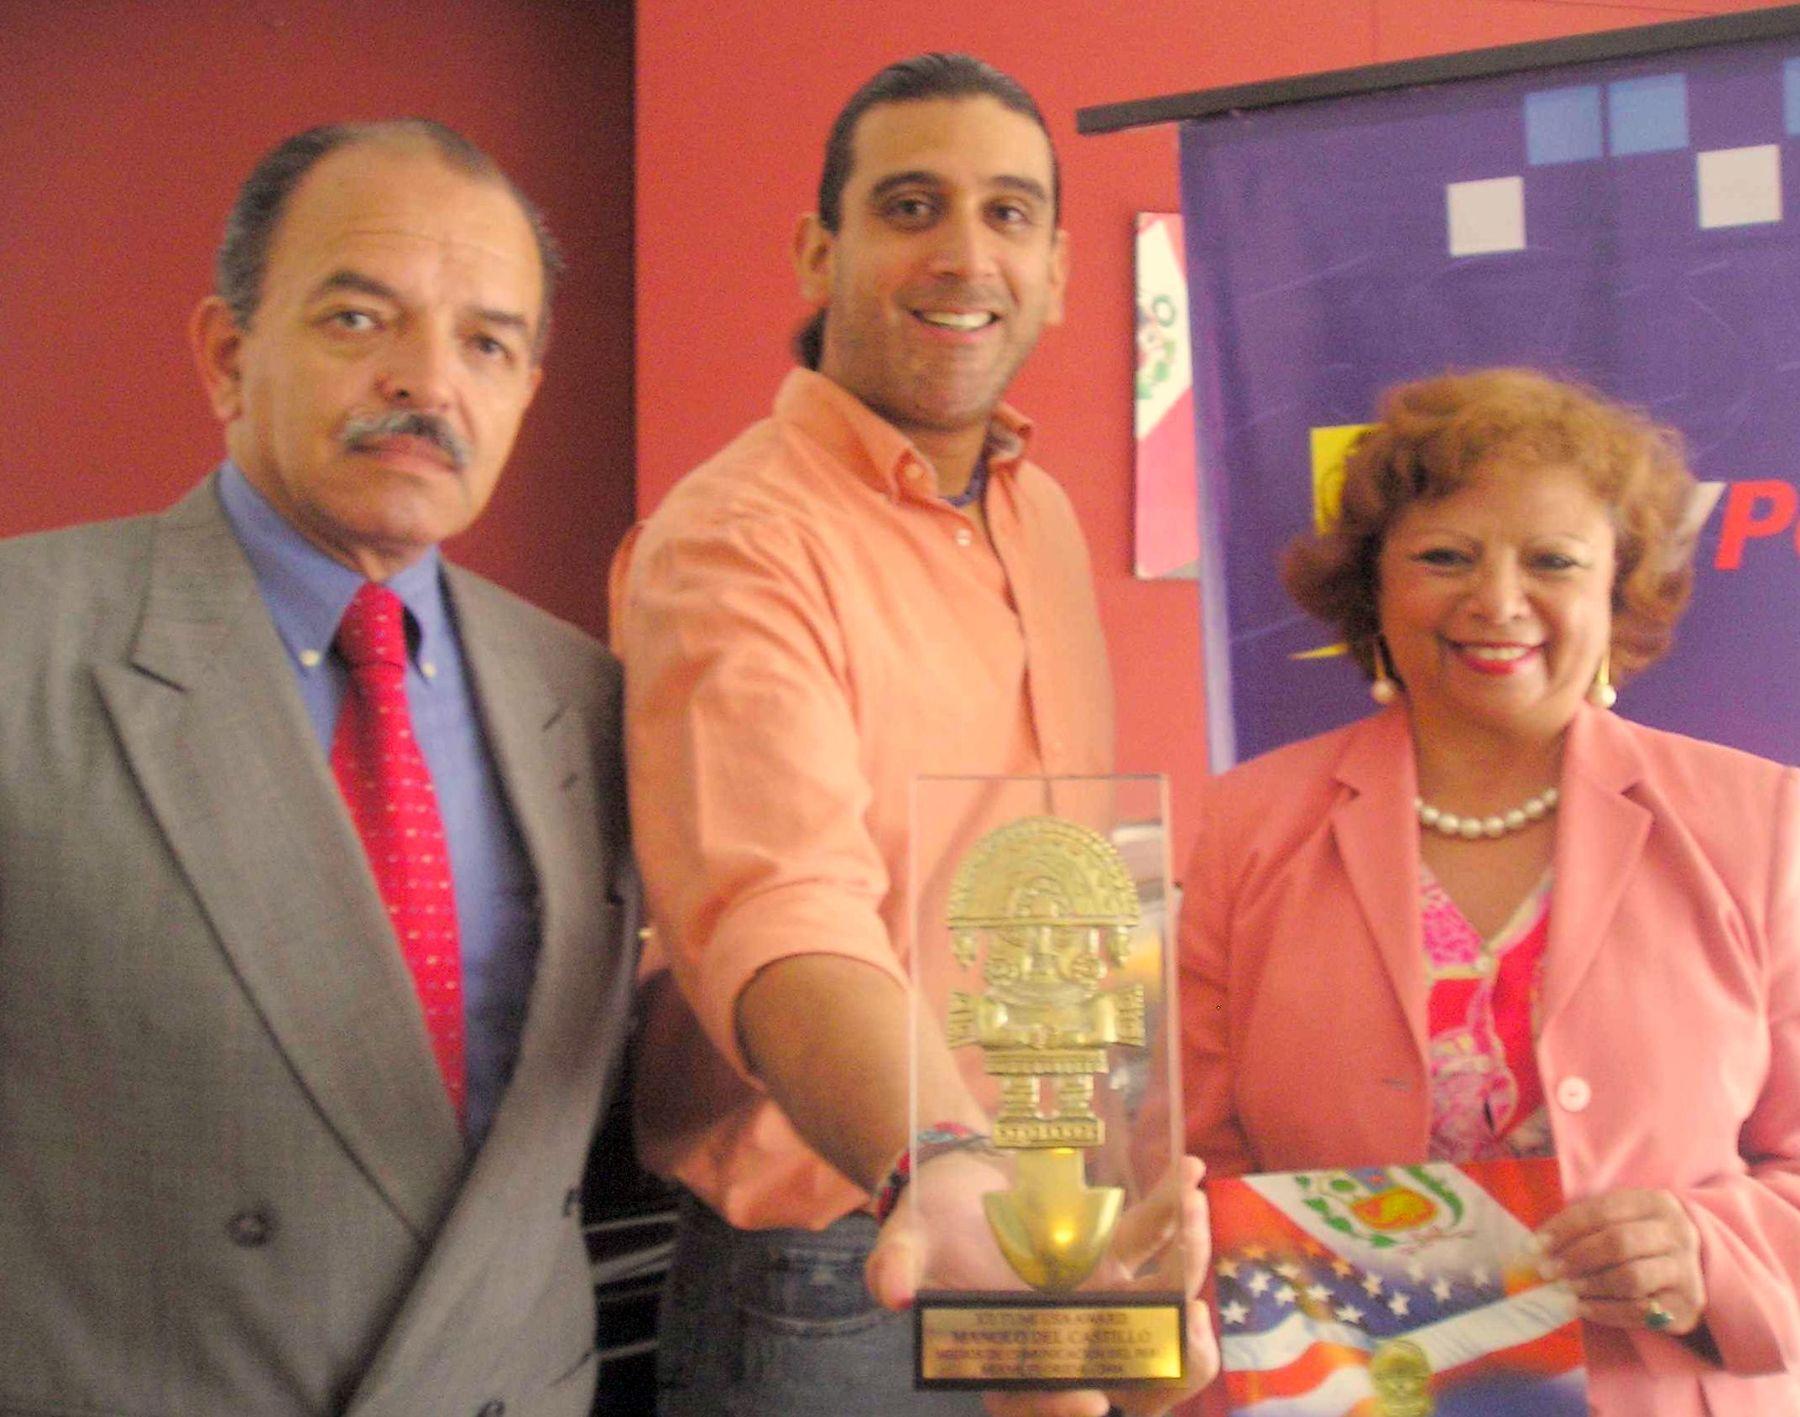 Ceremonia. Manolo junto a directores de Tumi USA Award.